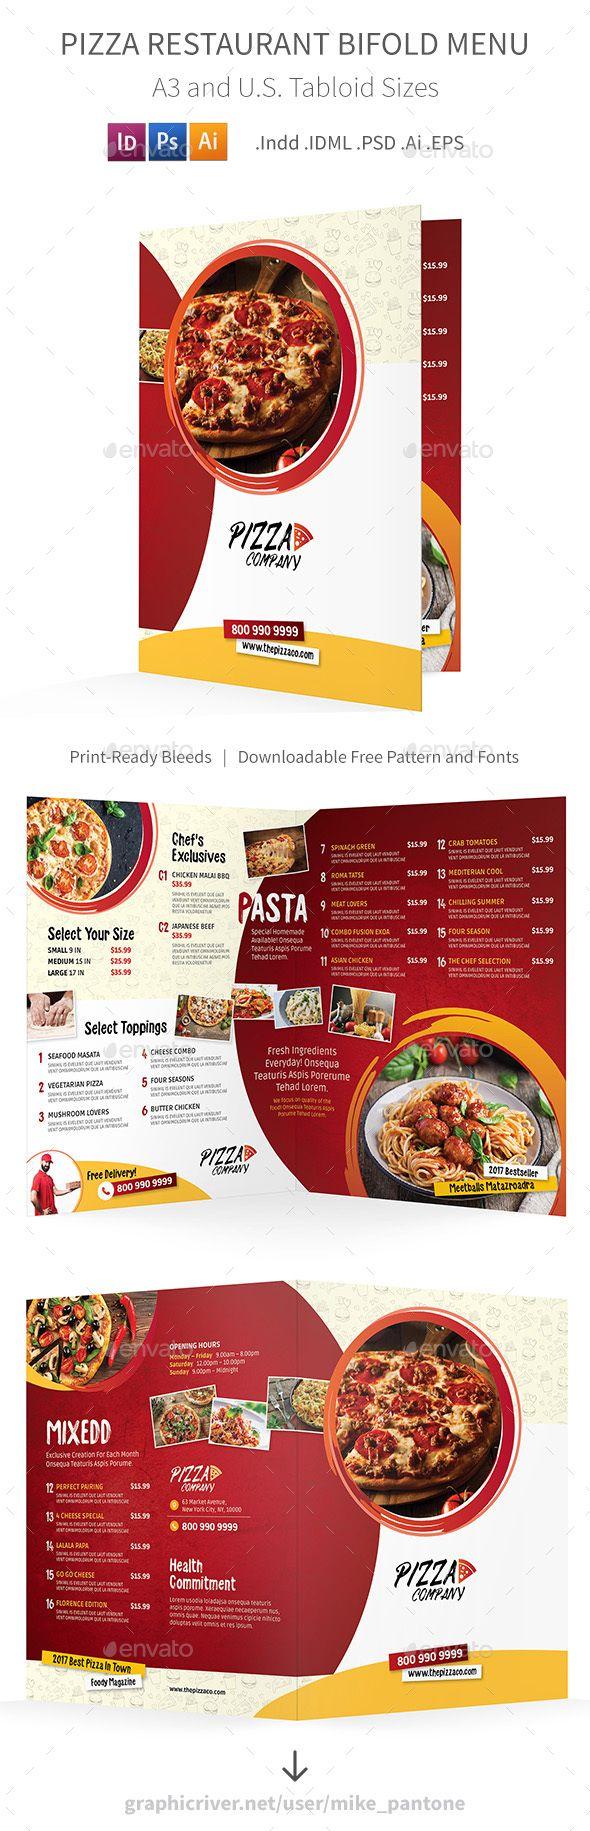 Pizza Restaurant Bifold / Halffold Menu 2 | Folletos, Suculentas y ...